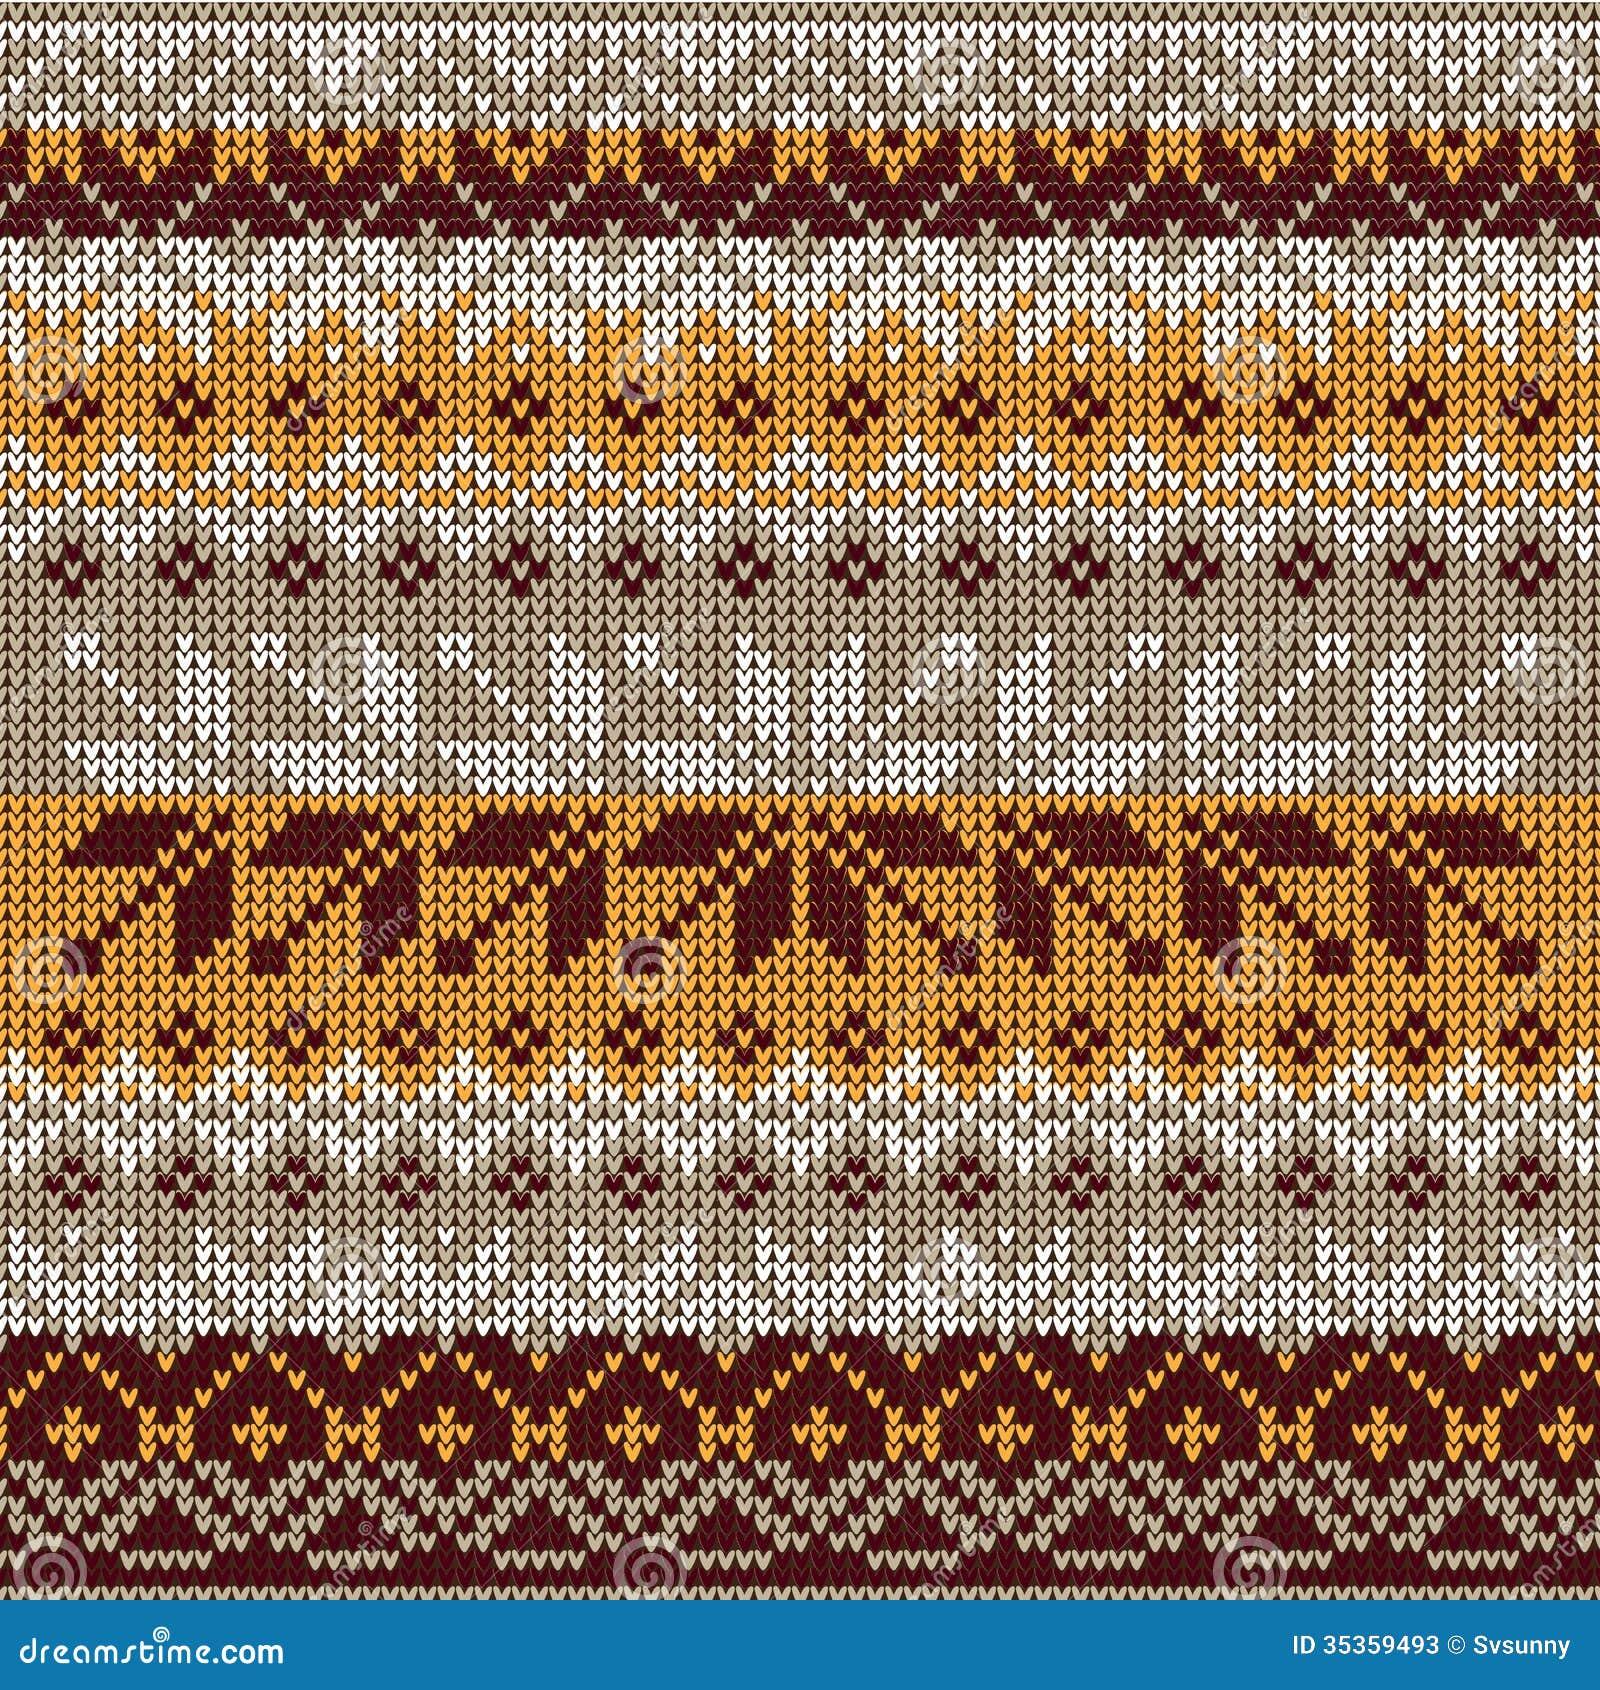 nahtloses gestricktes muster der skandinavischen art farben gelb whi stockfotos bild 35359493. Black Bedroom Furniture Sets. Home Design Ideas